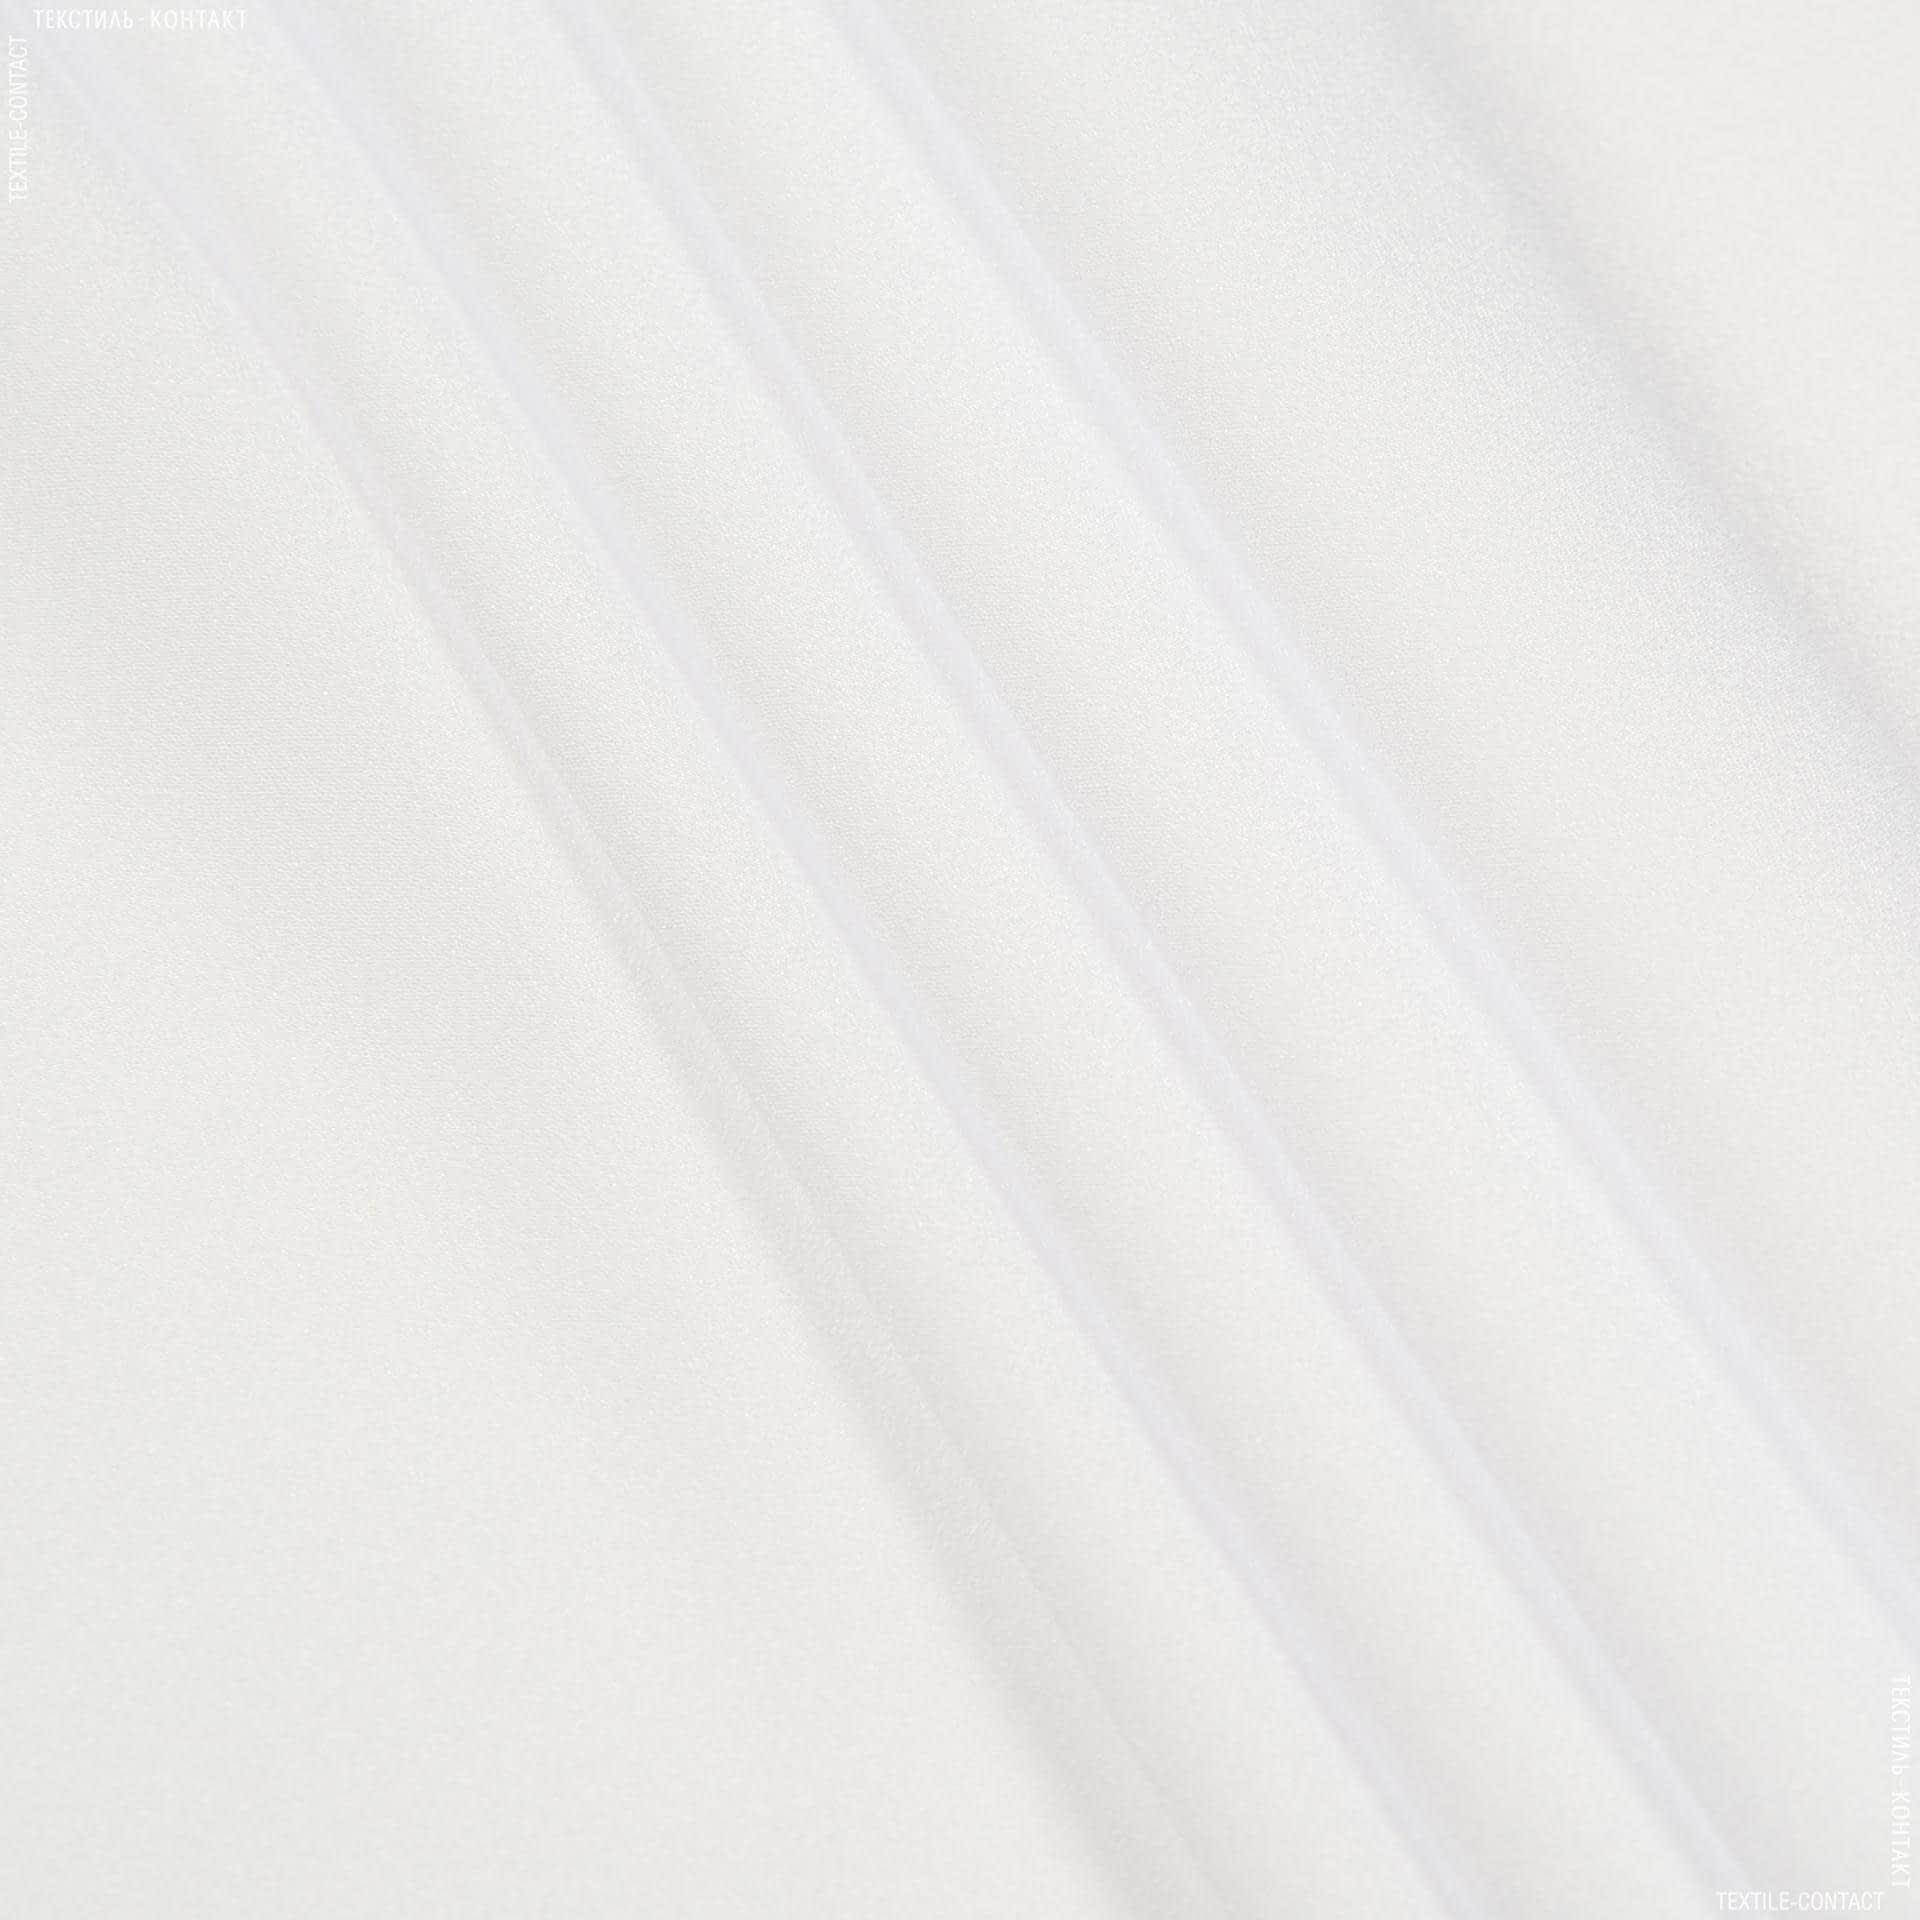 Ткани для платков и бандан - Крепдешин белый